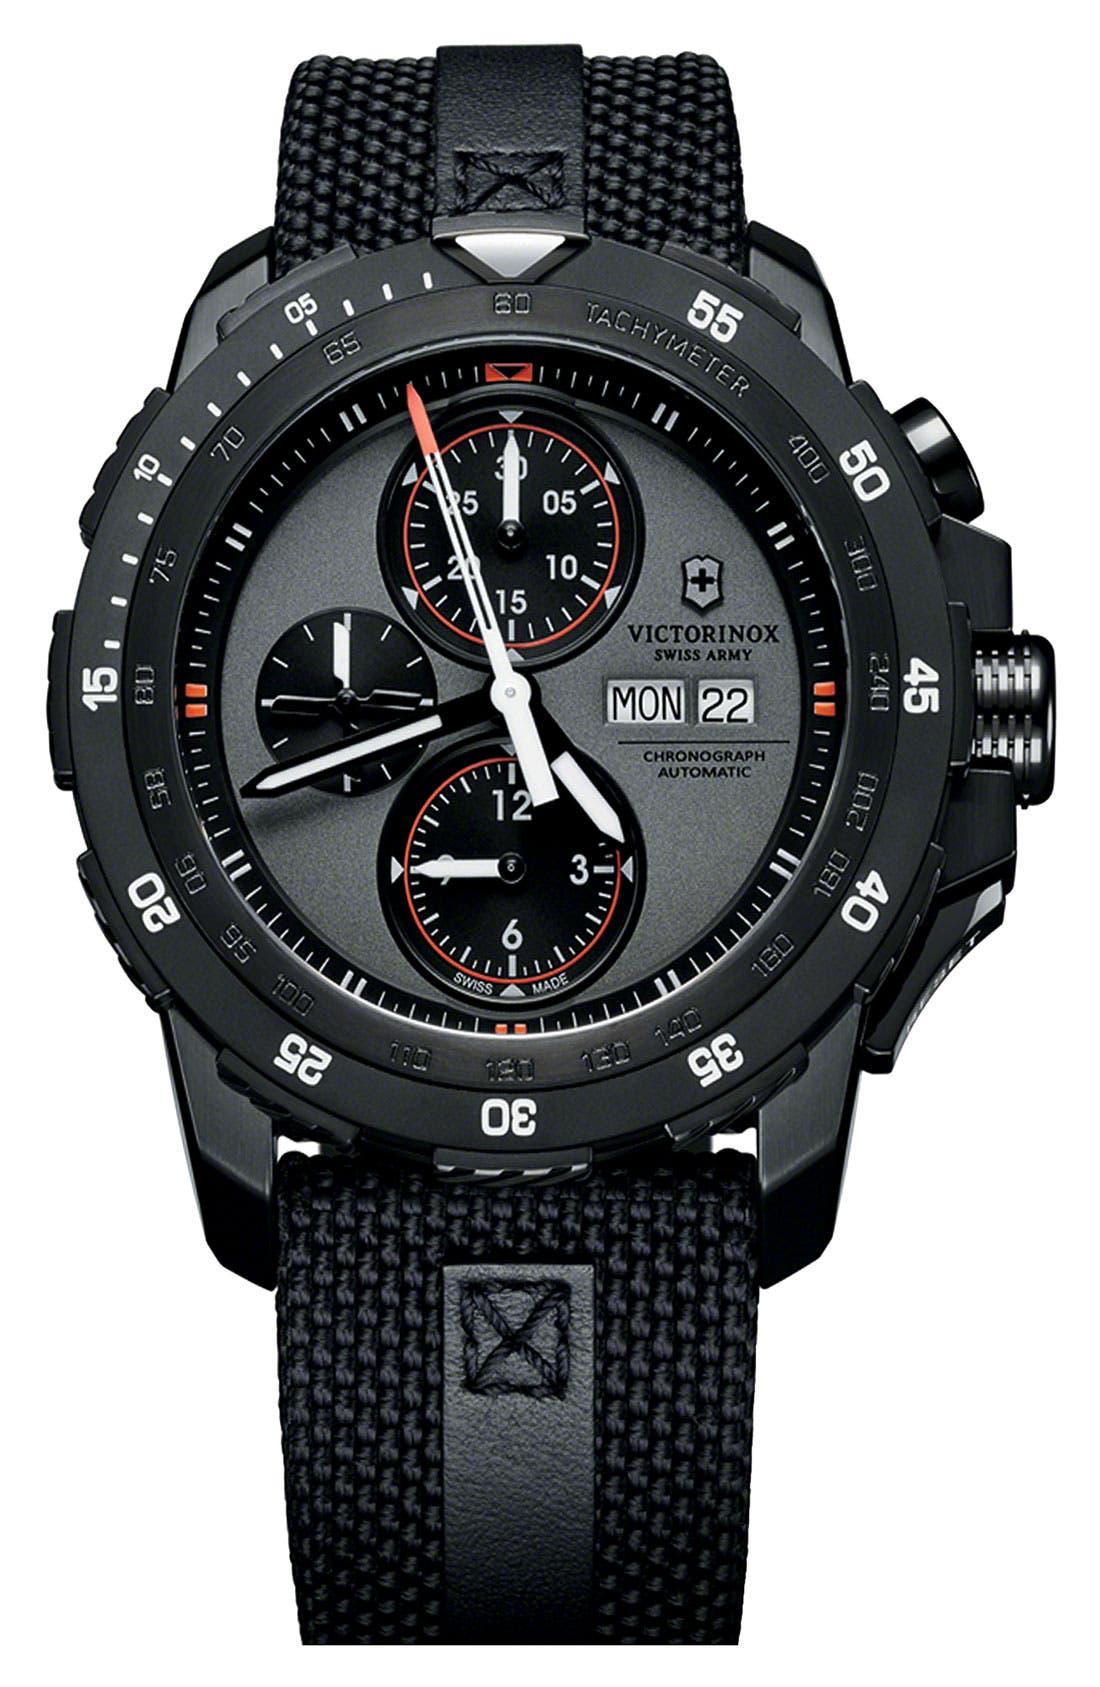 Main Image - Victorinox Swiss Army® 'Alpnach' Automatic Chronograph Watch, 44mm